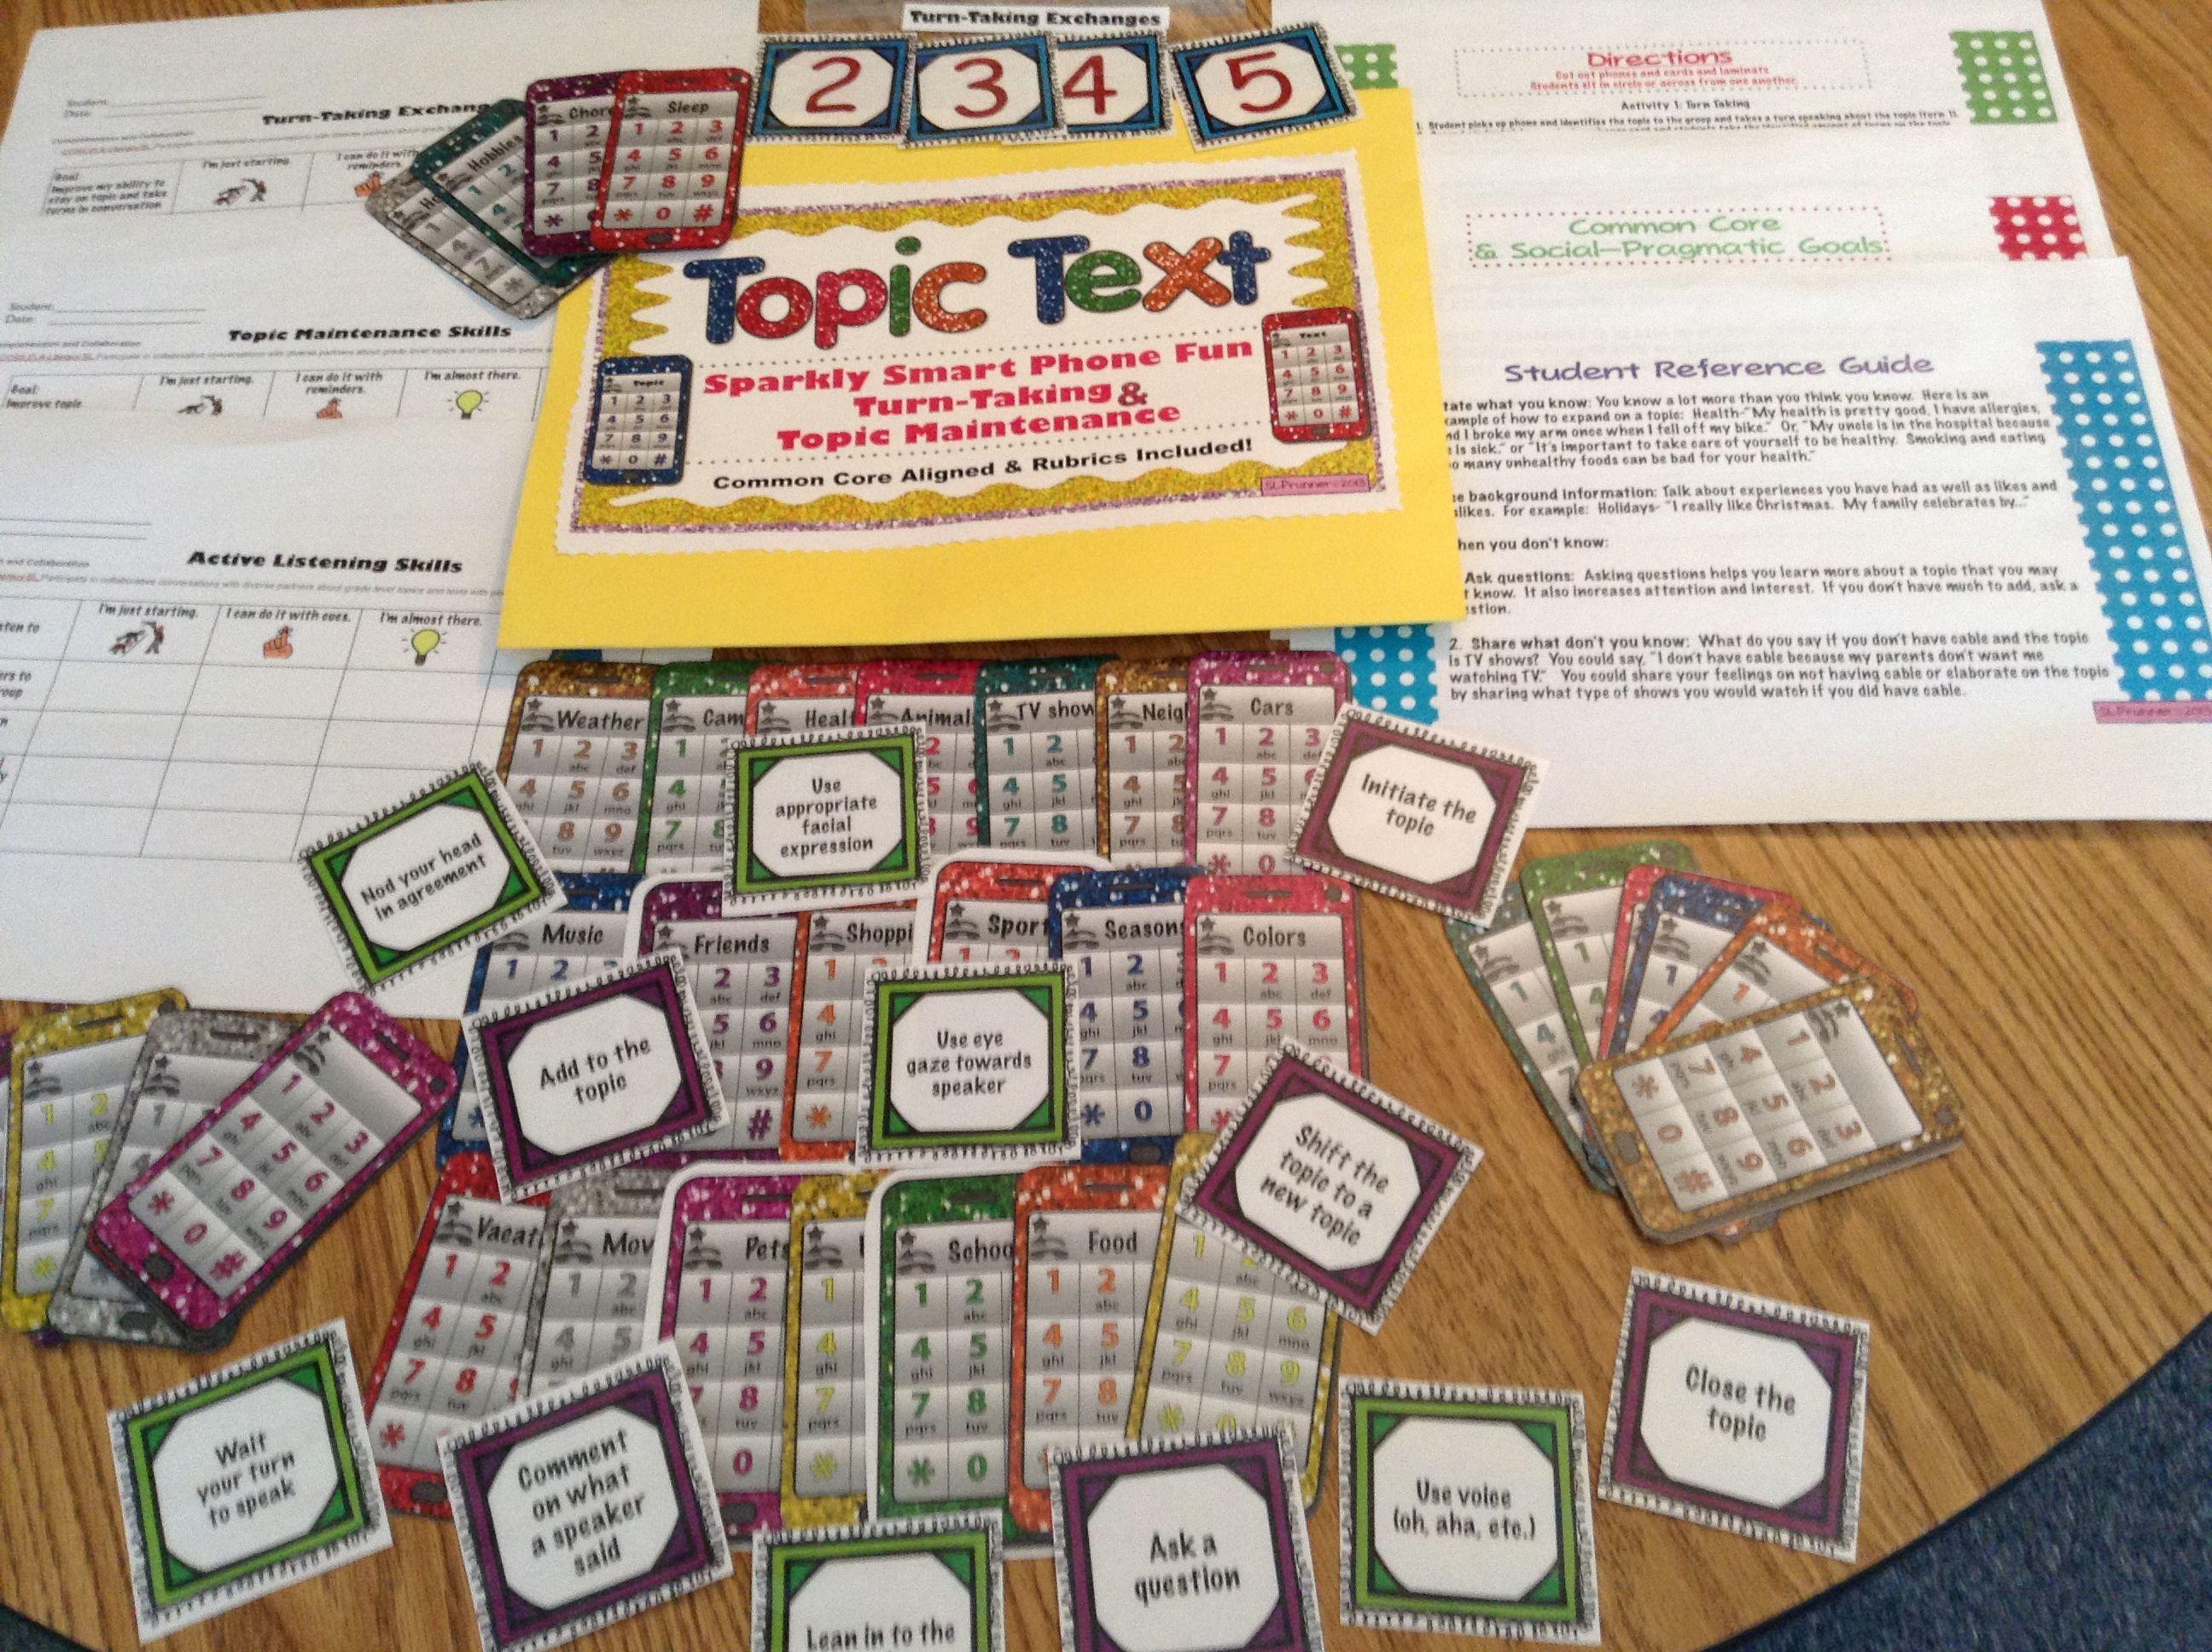 Pragmatic Social Language Skills Topic Text 4 Activities